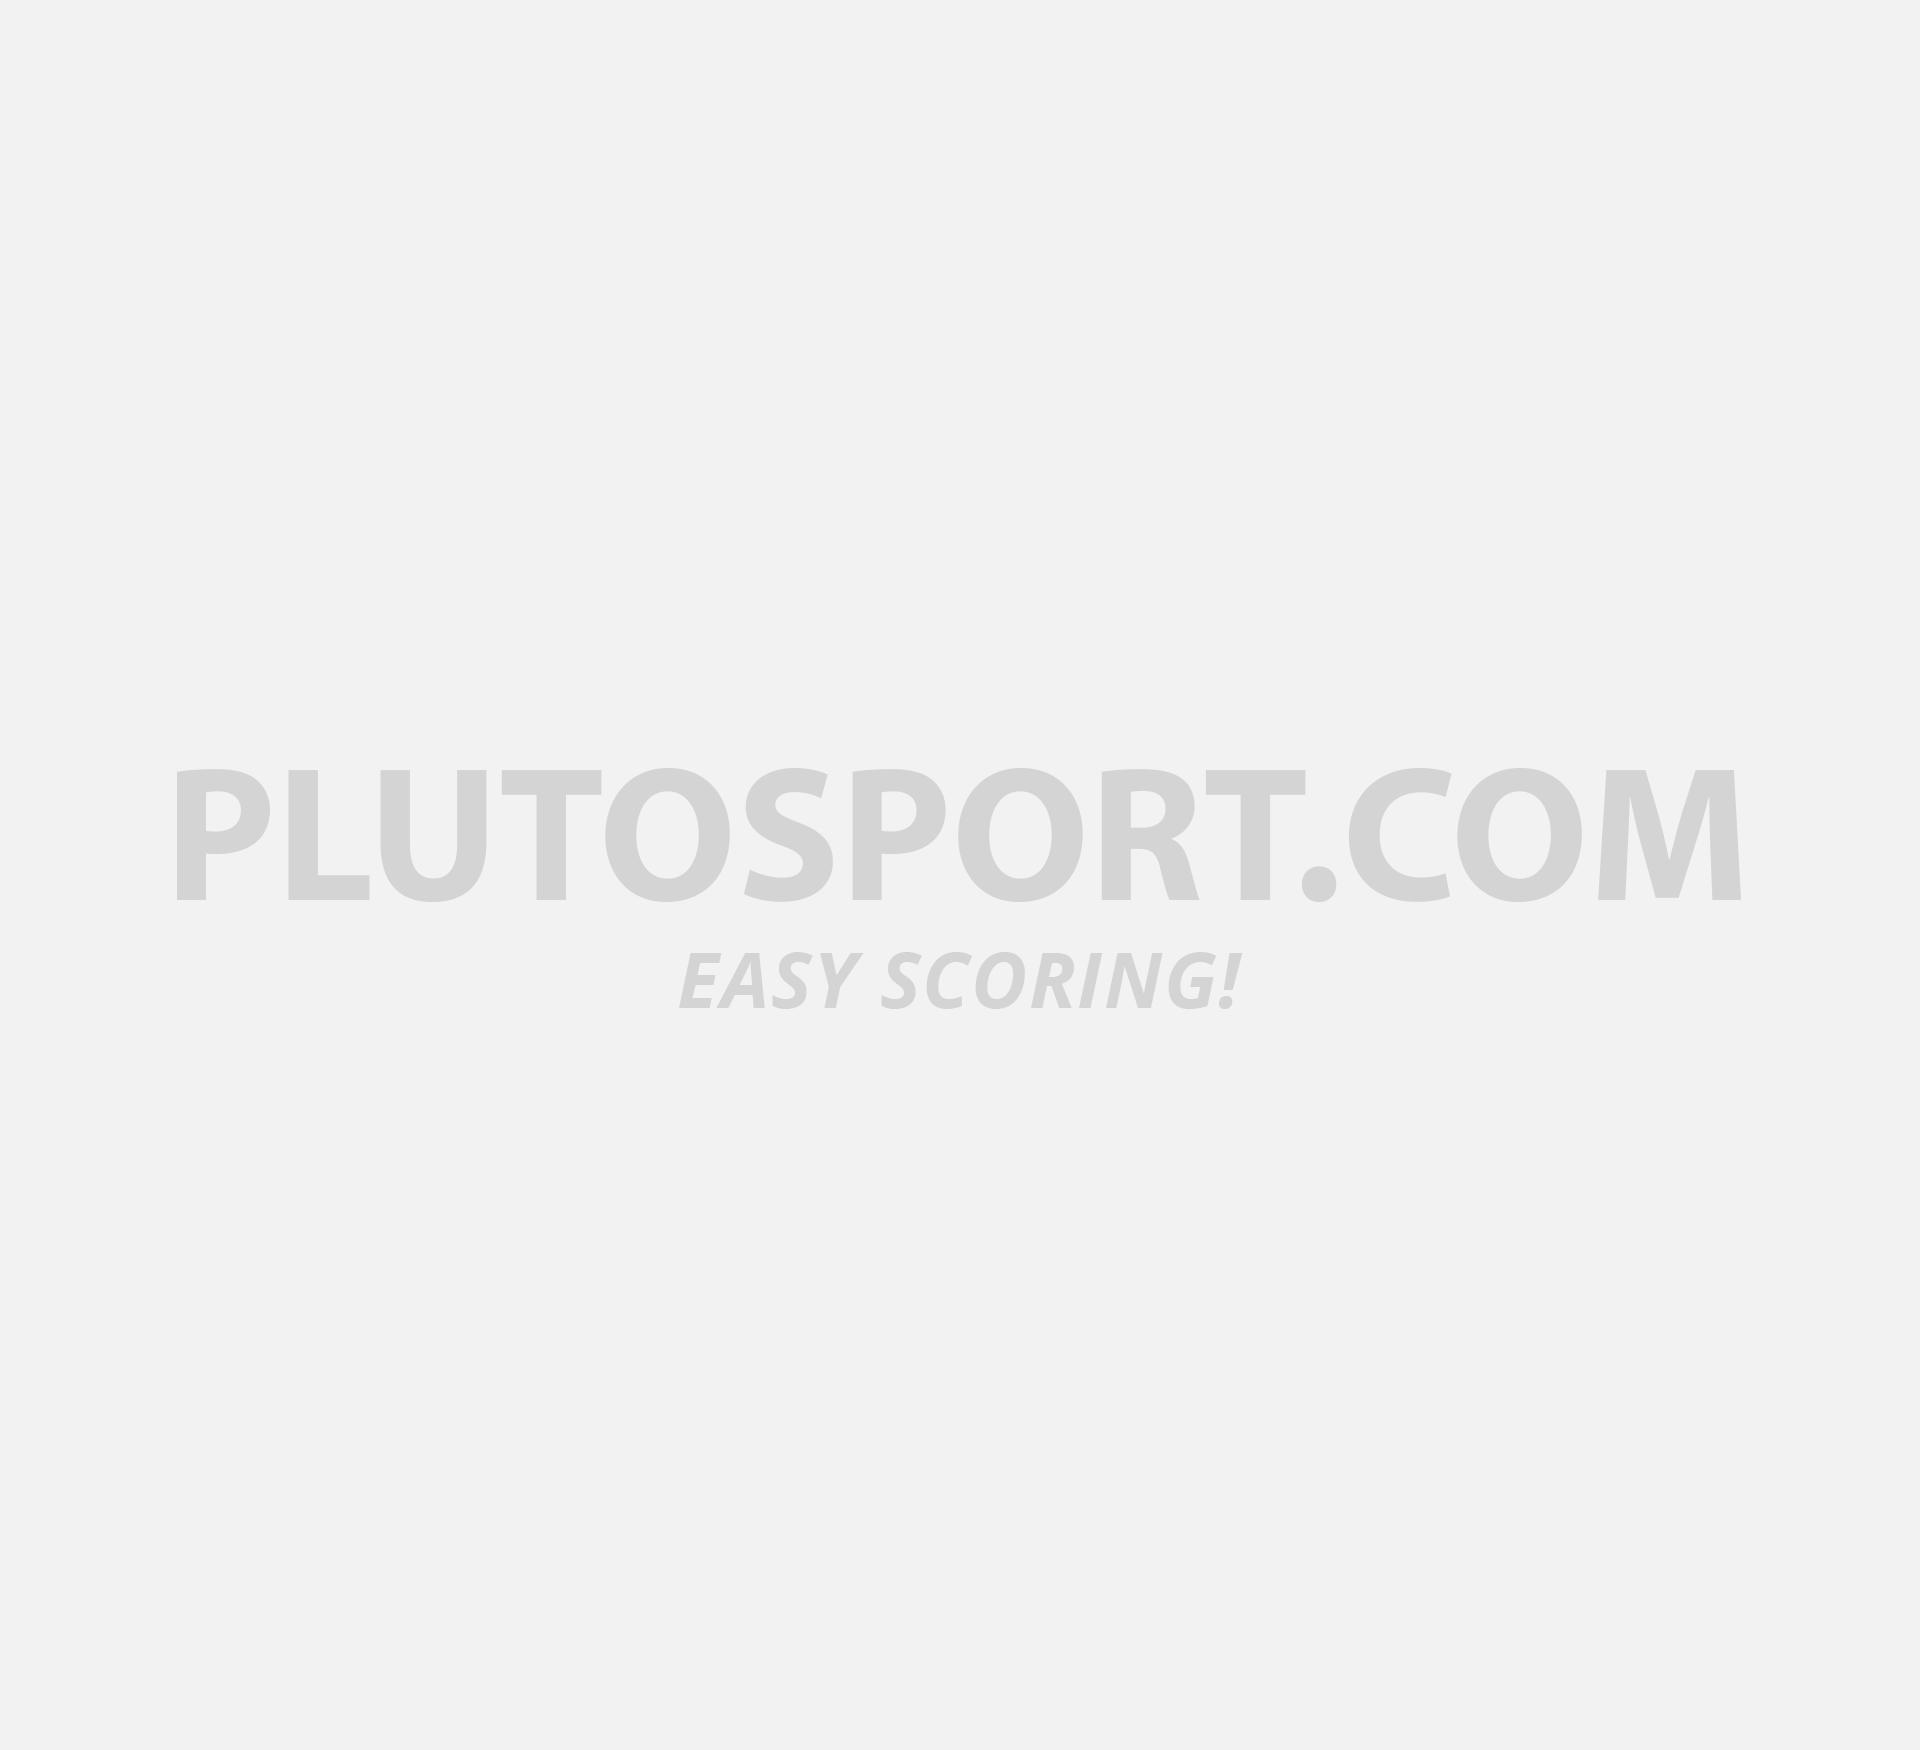 sports shoes d649b 317a4 Nike Air Max 90 Breeze Sneakers Men - Sneakers - Shoes - Lifestyle - Sports    Plutosport